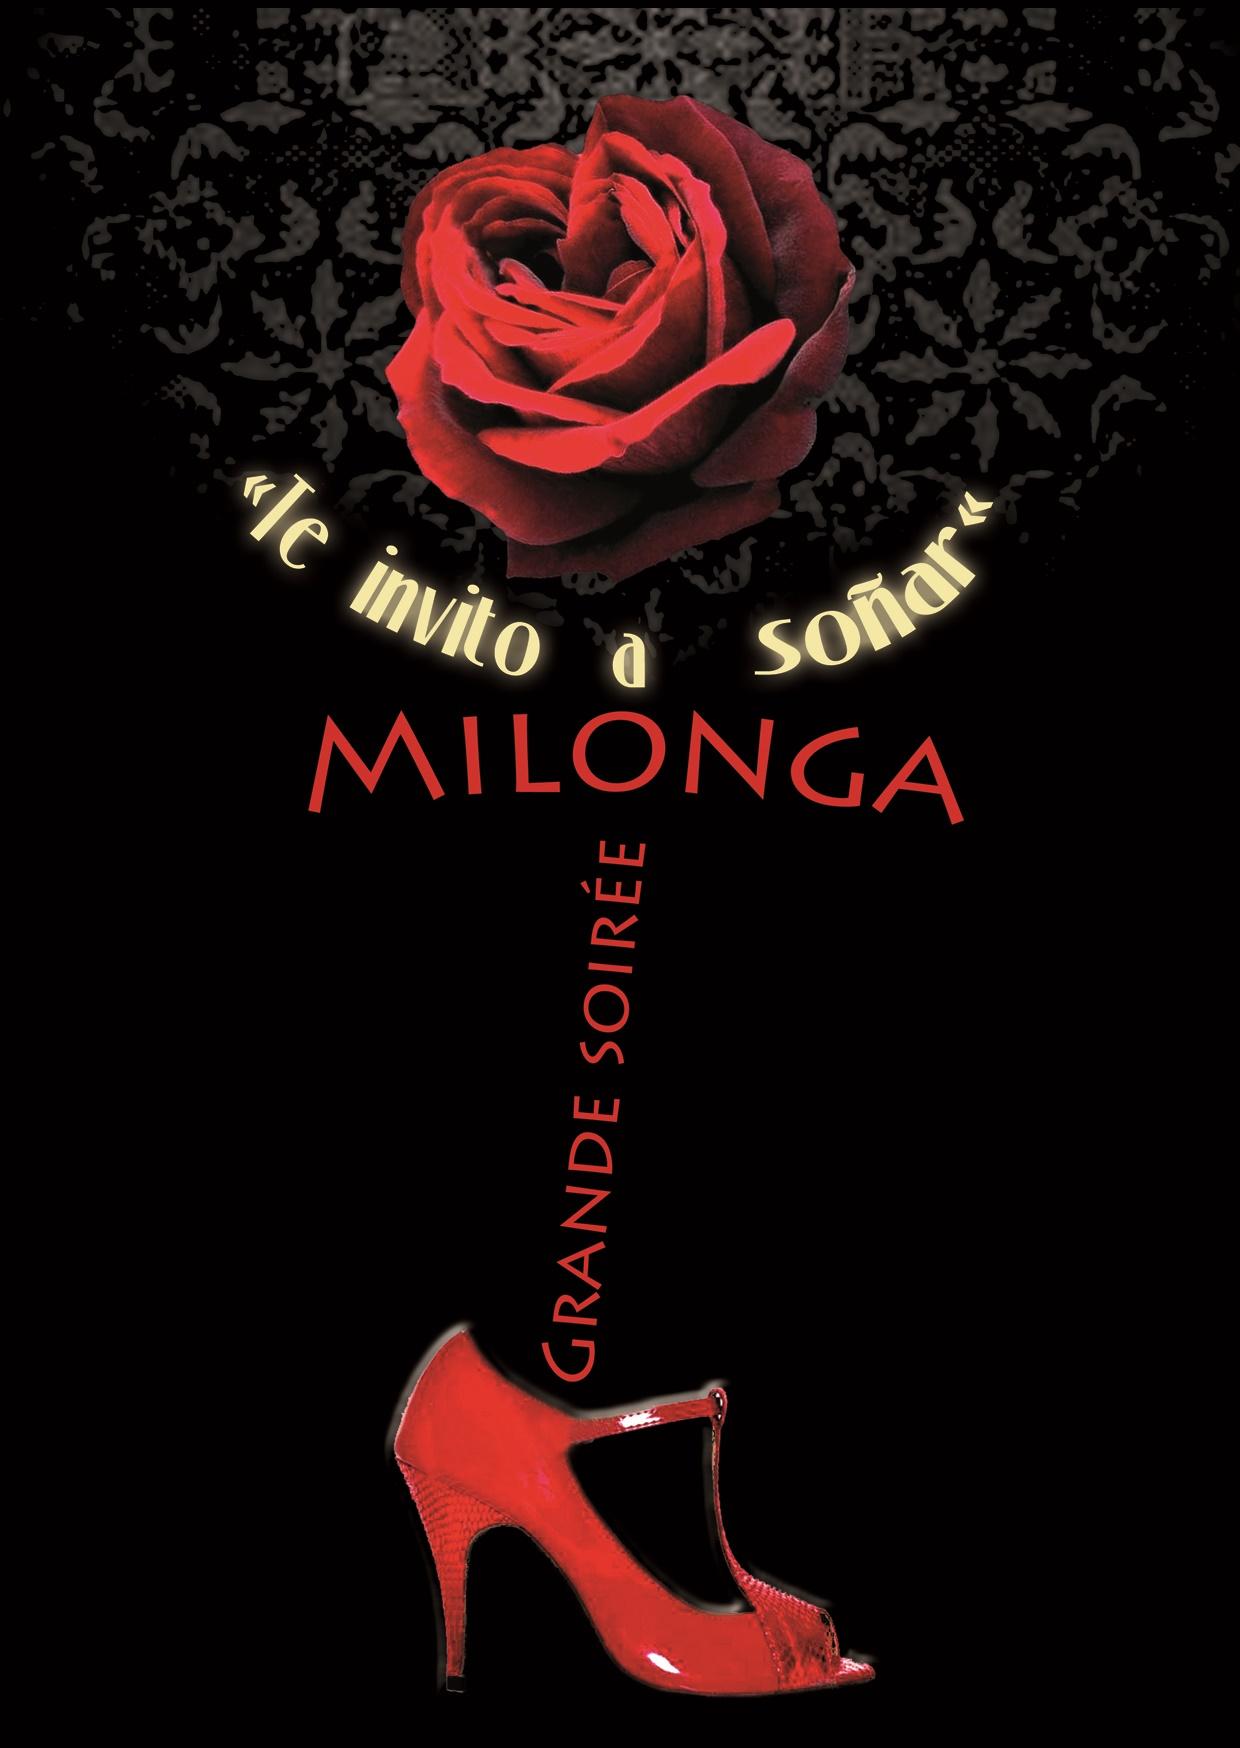 Soirée Milonga